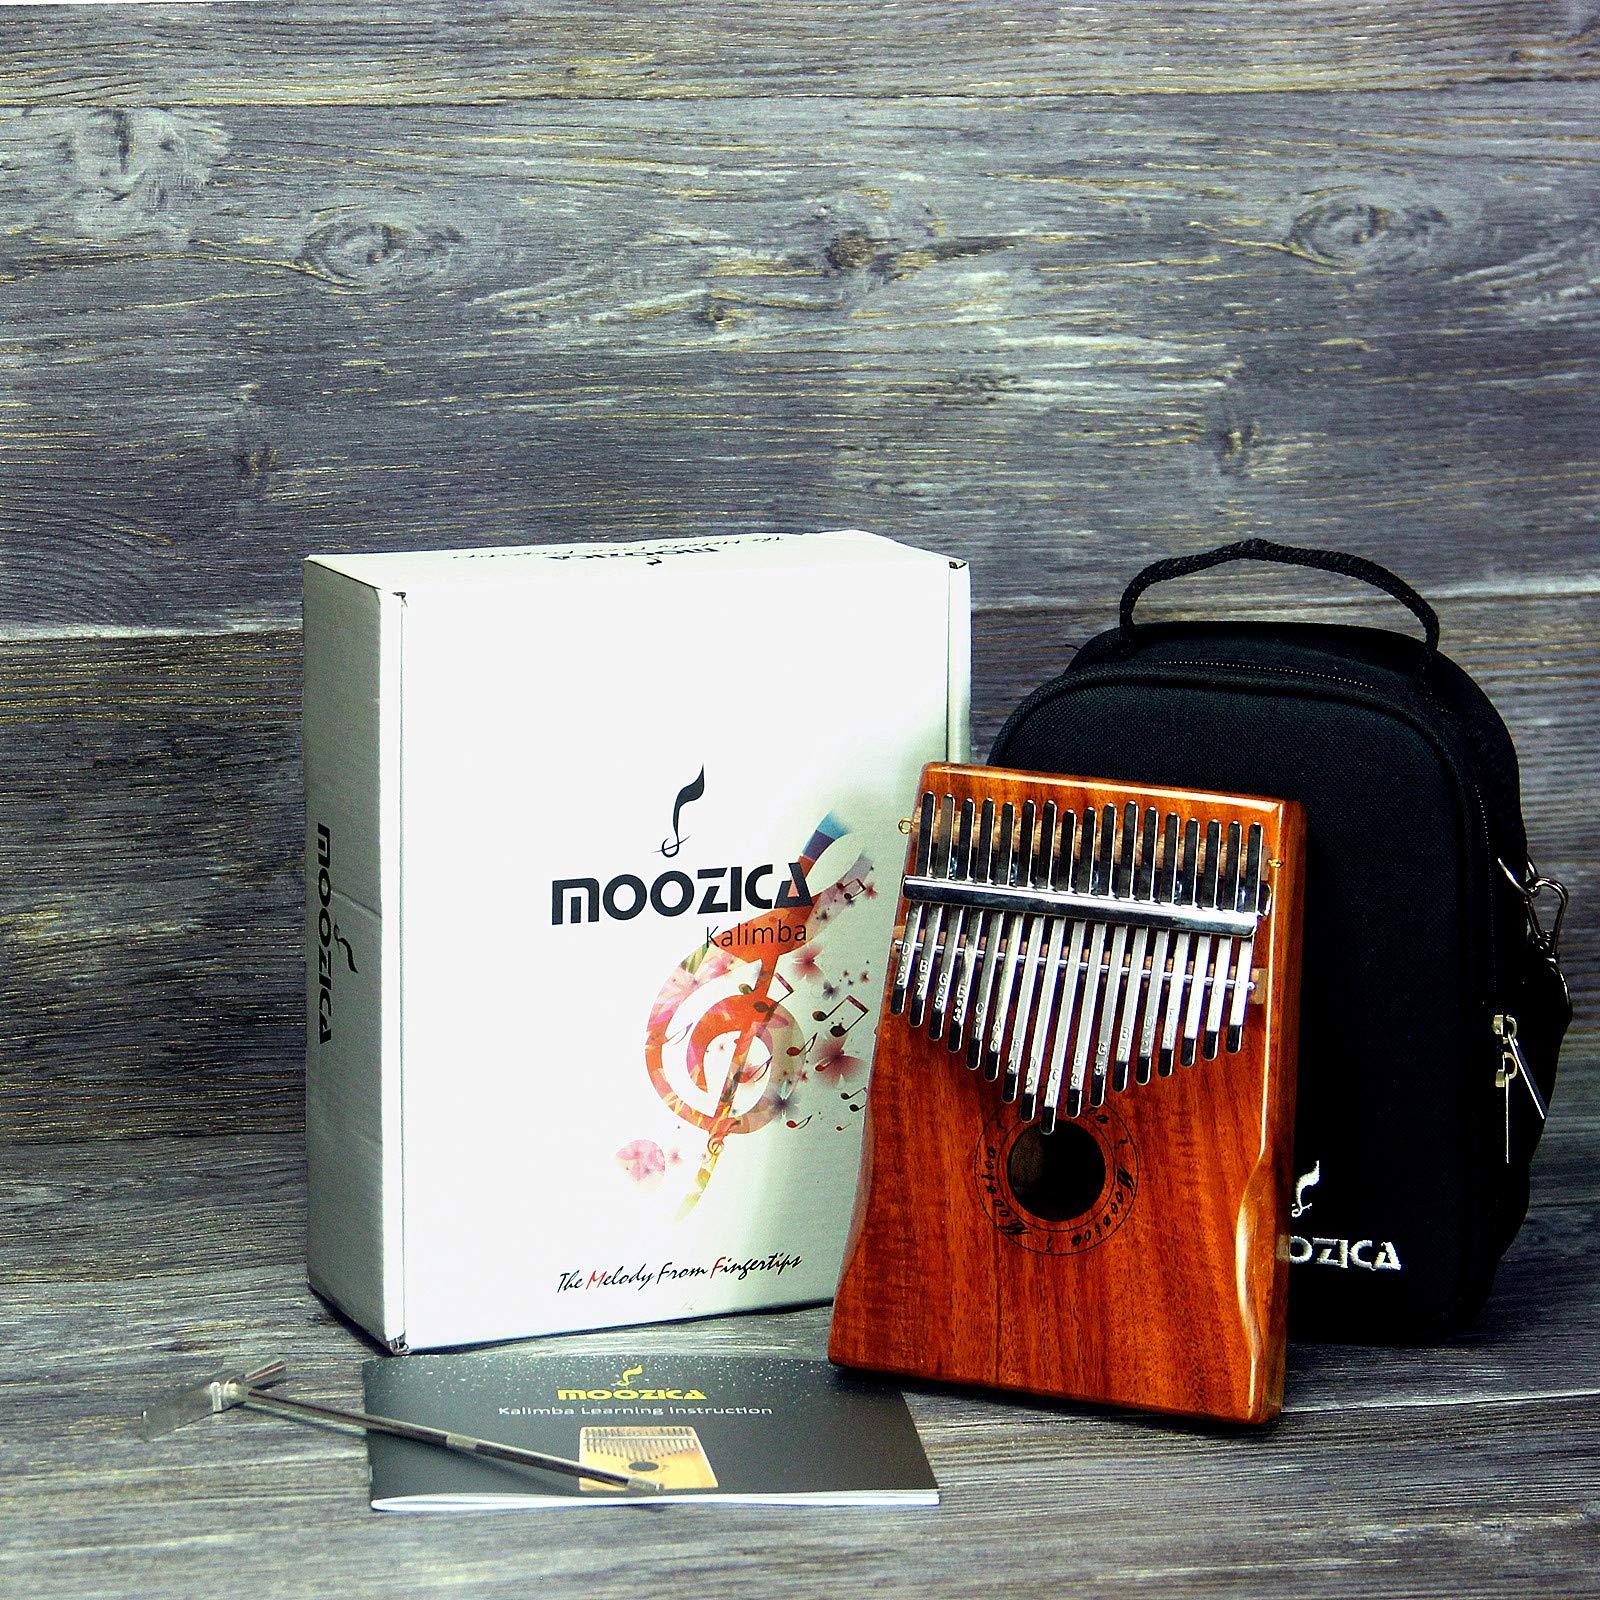 Moozica 17 Keys Kalimba Marimba, Professional Thumb Piano Sanza Mbira Musical Instrument Gift (Koa - K17K) by Moozica (Image #6)